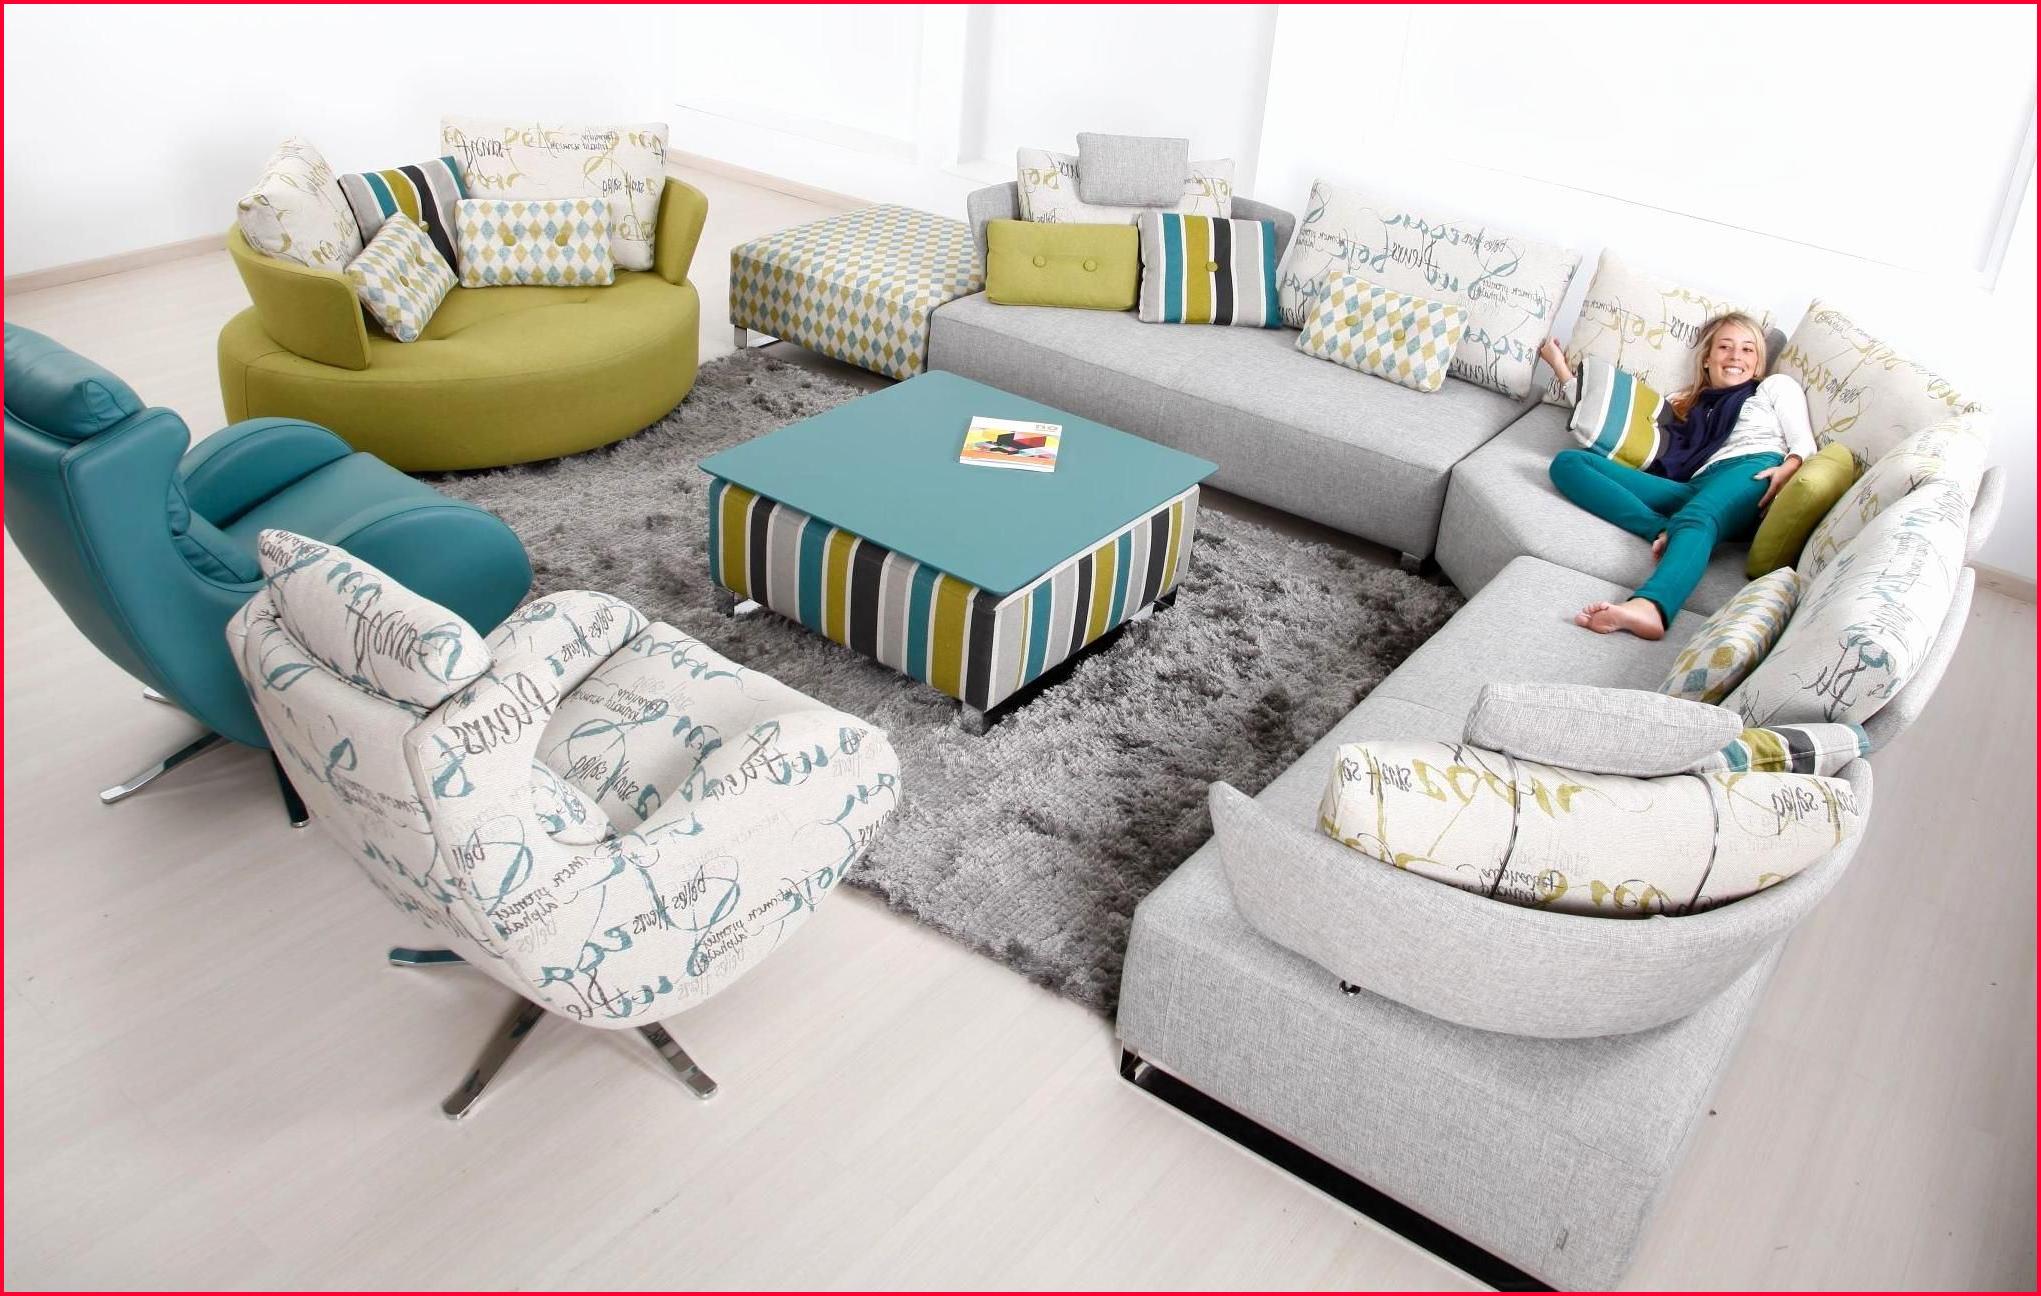 Muebles Baratos Murcia Liquidacion Kvdd sofa Cama Murcia Liquidacion Muebles Madrid Beautiful sofas